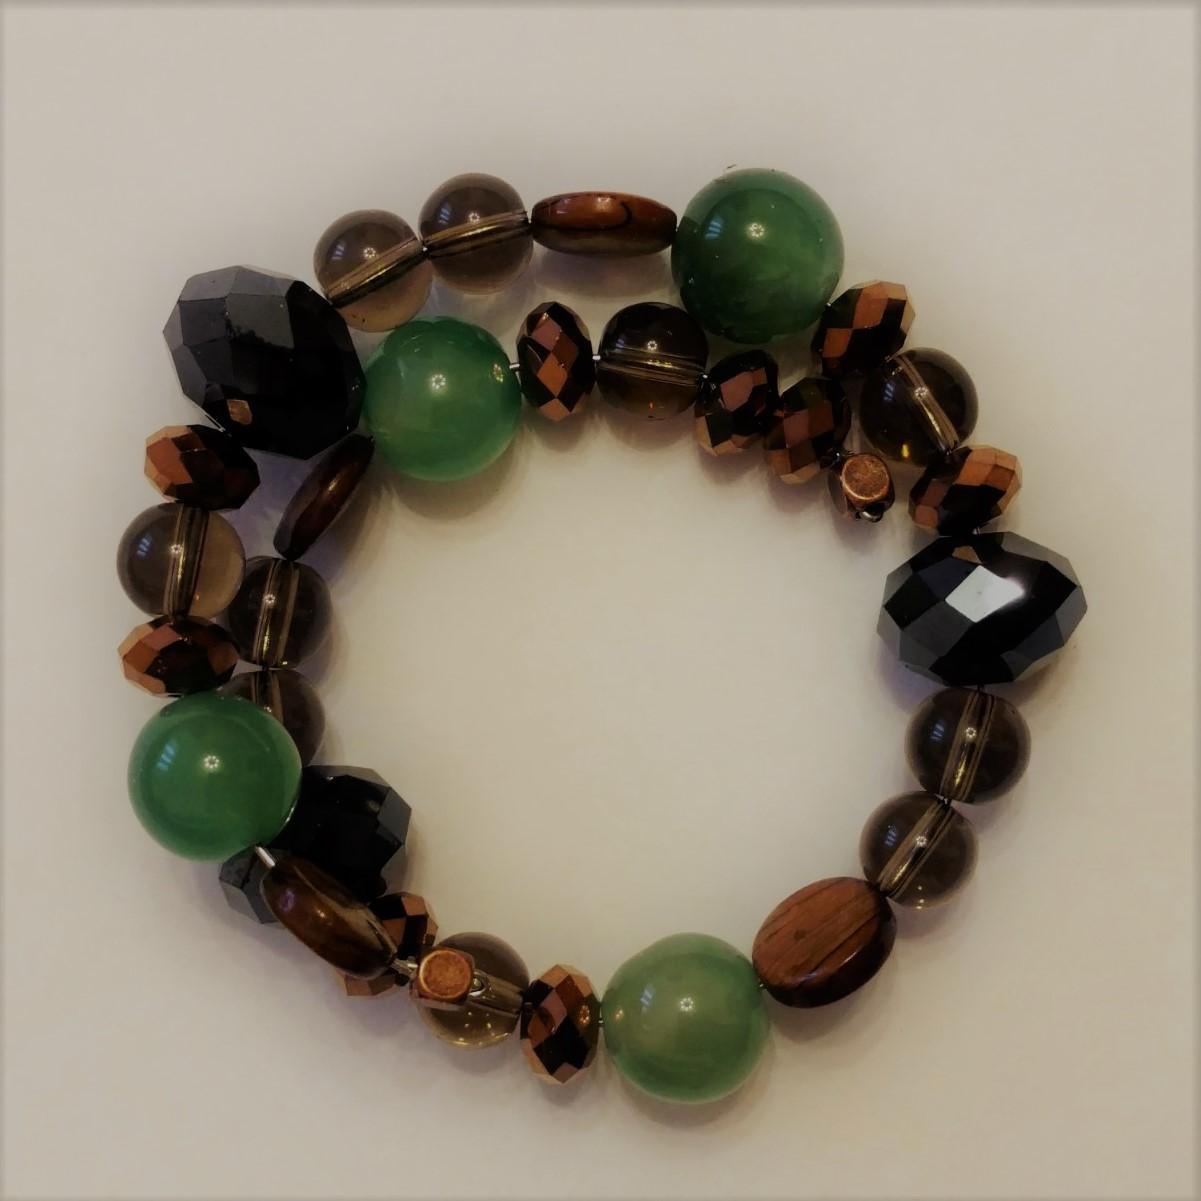 #L&L 181209 Bracelet  Suggested $20 USD